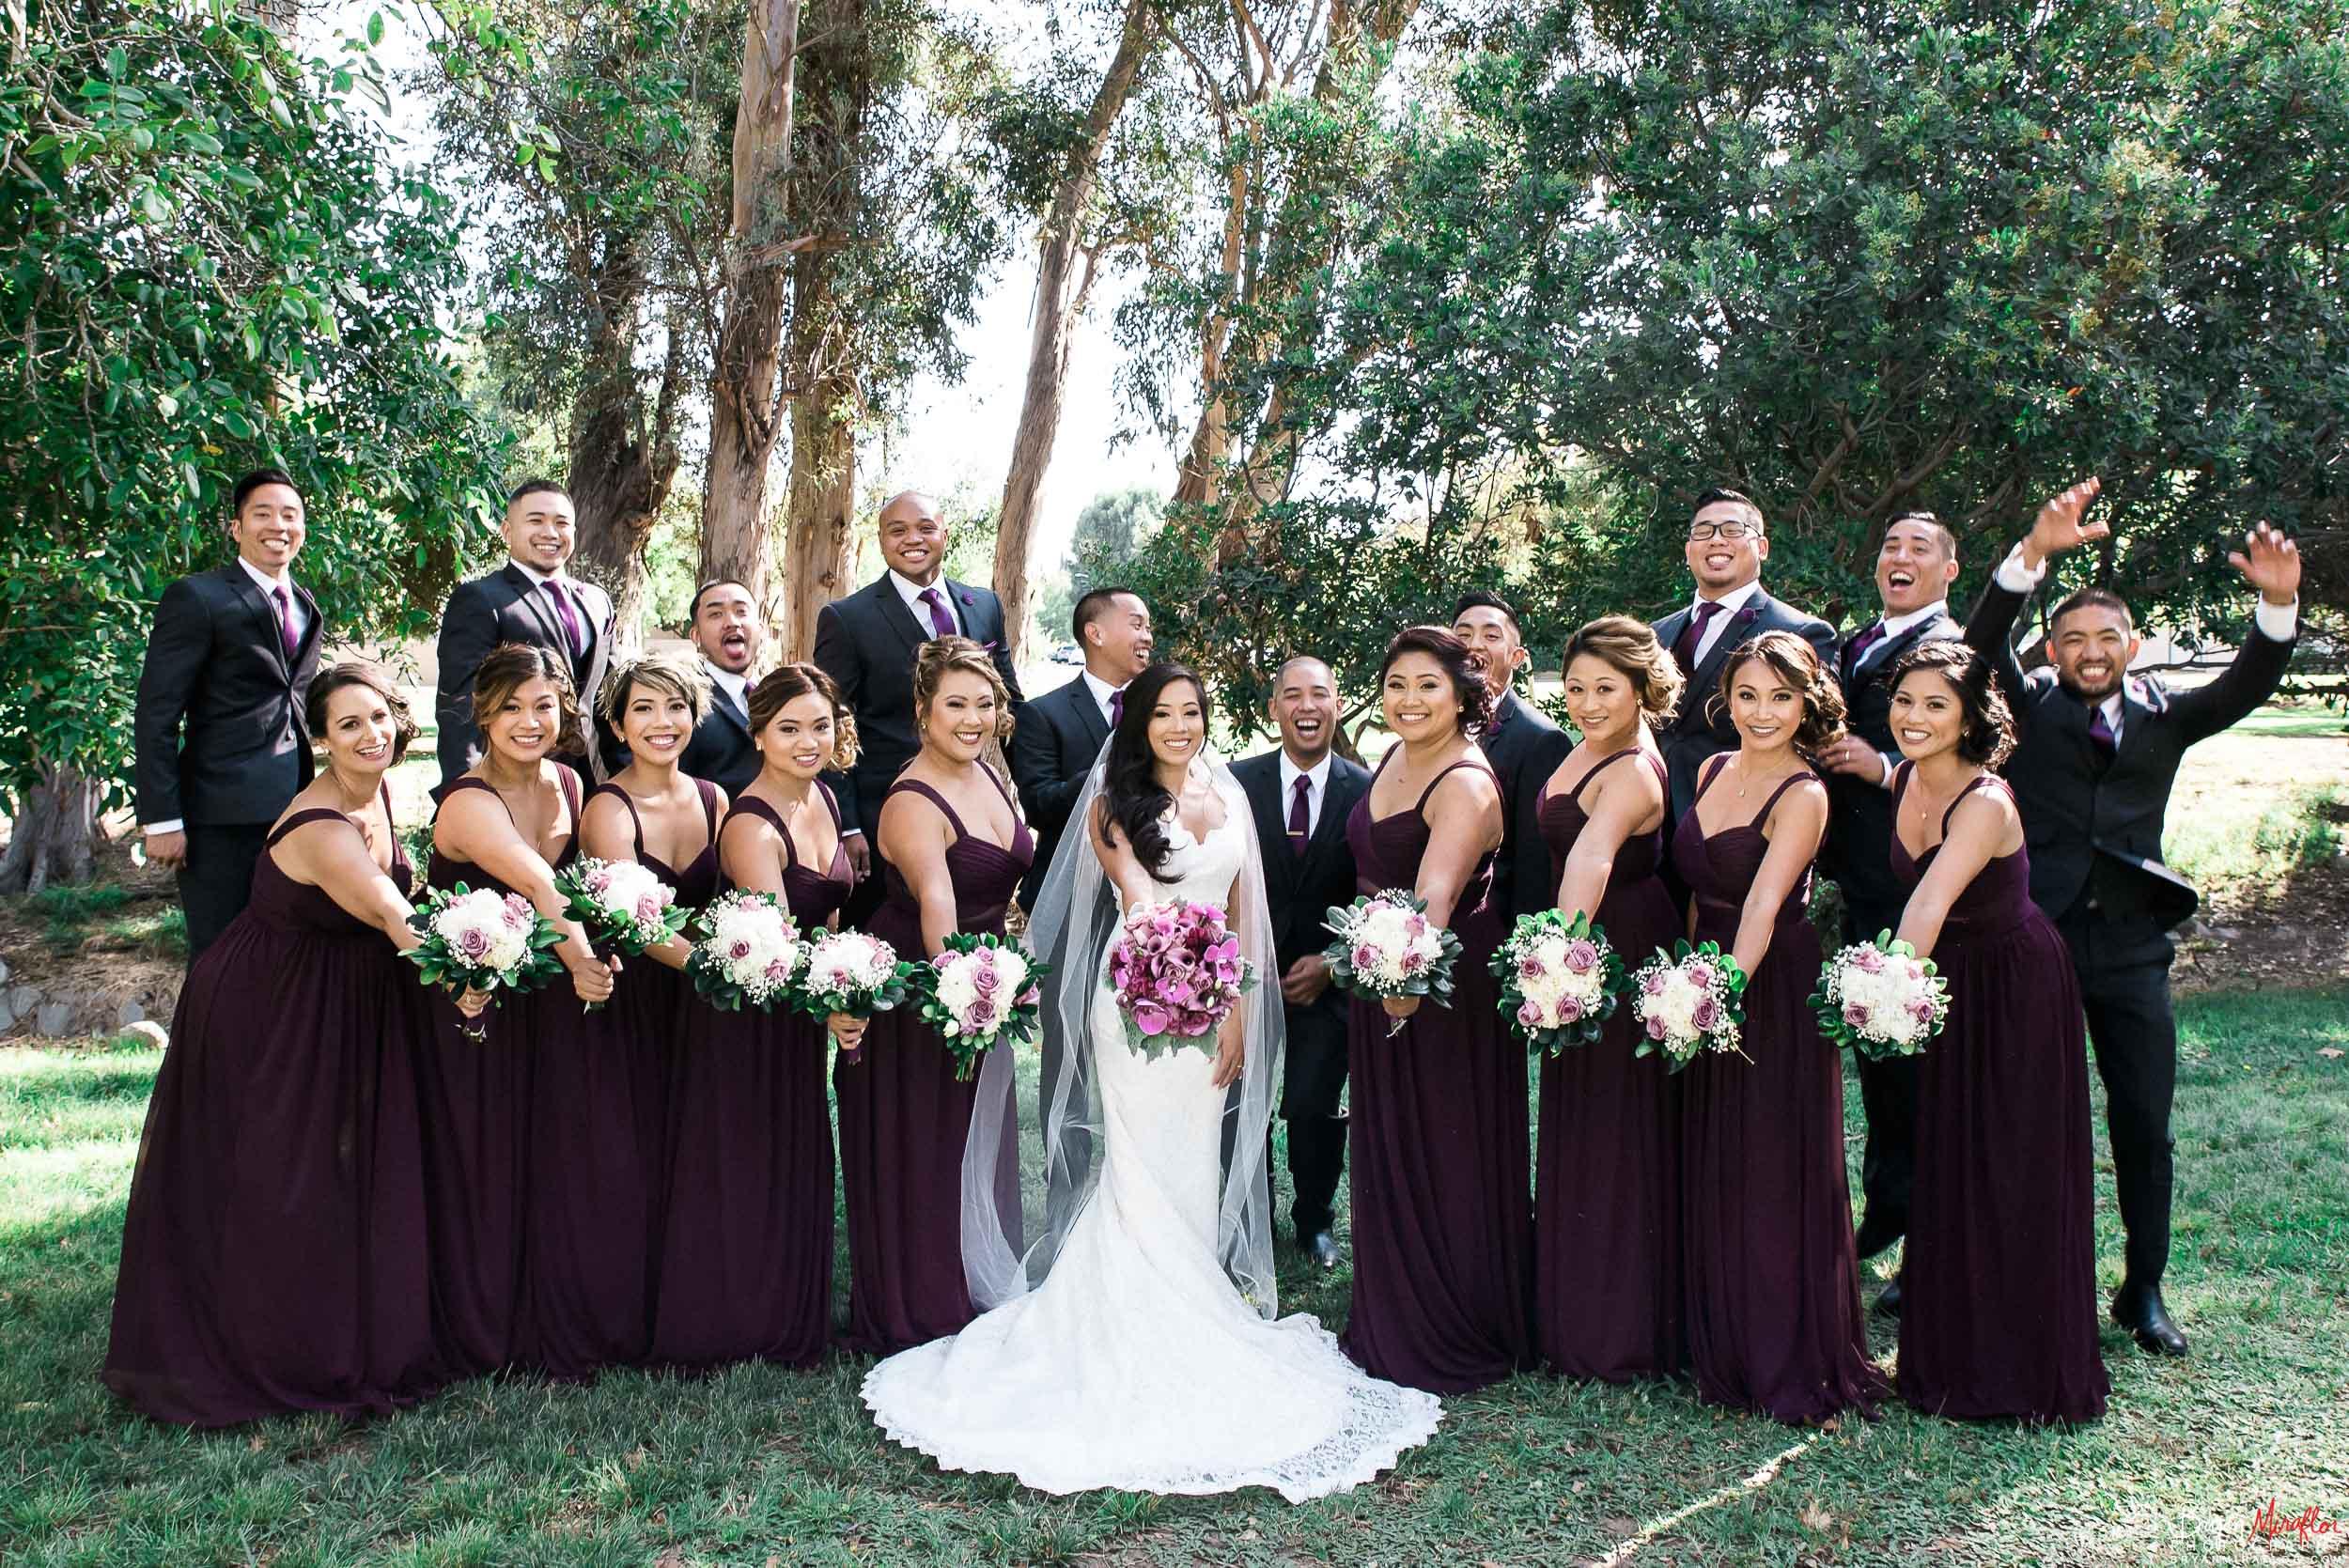 Bryan-Miraflor-Photography-Trisha-Dexter-Married-20170923-027.jpg